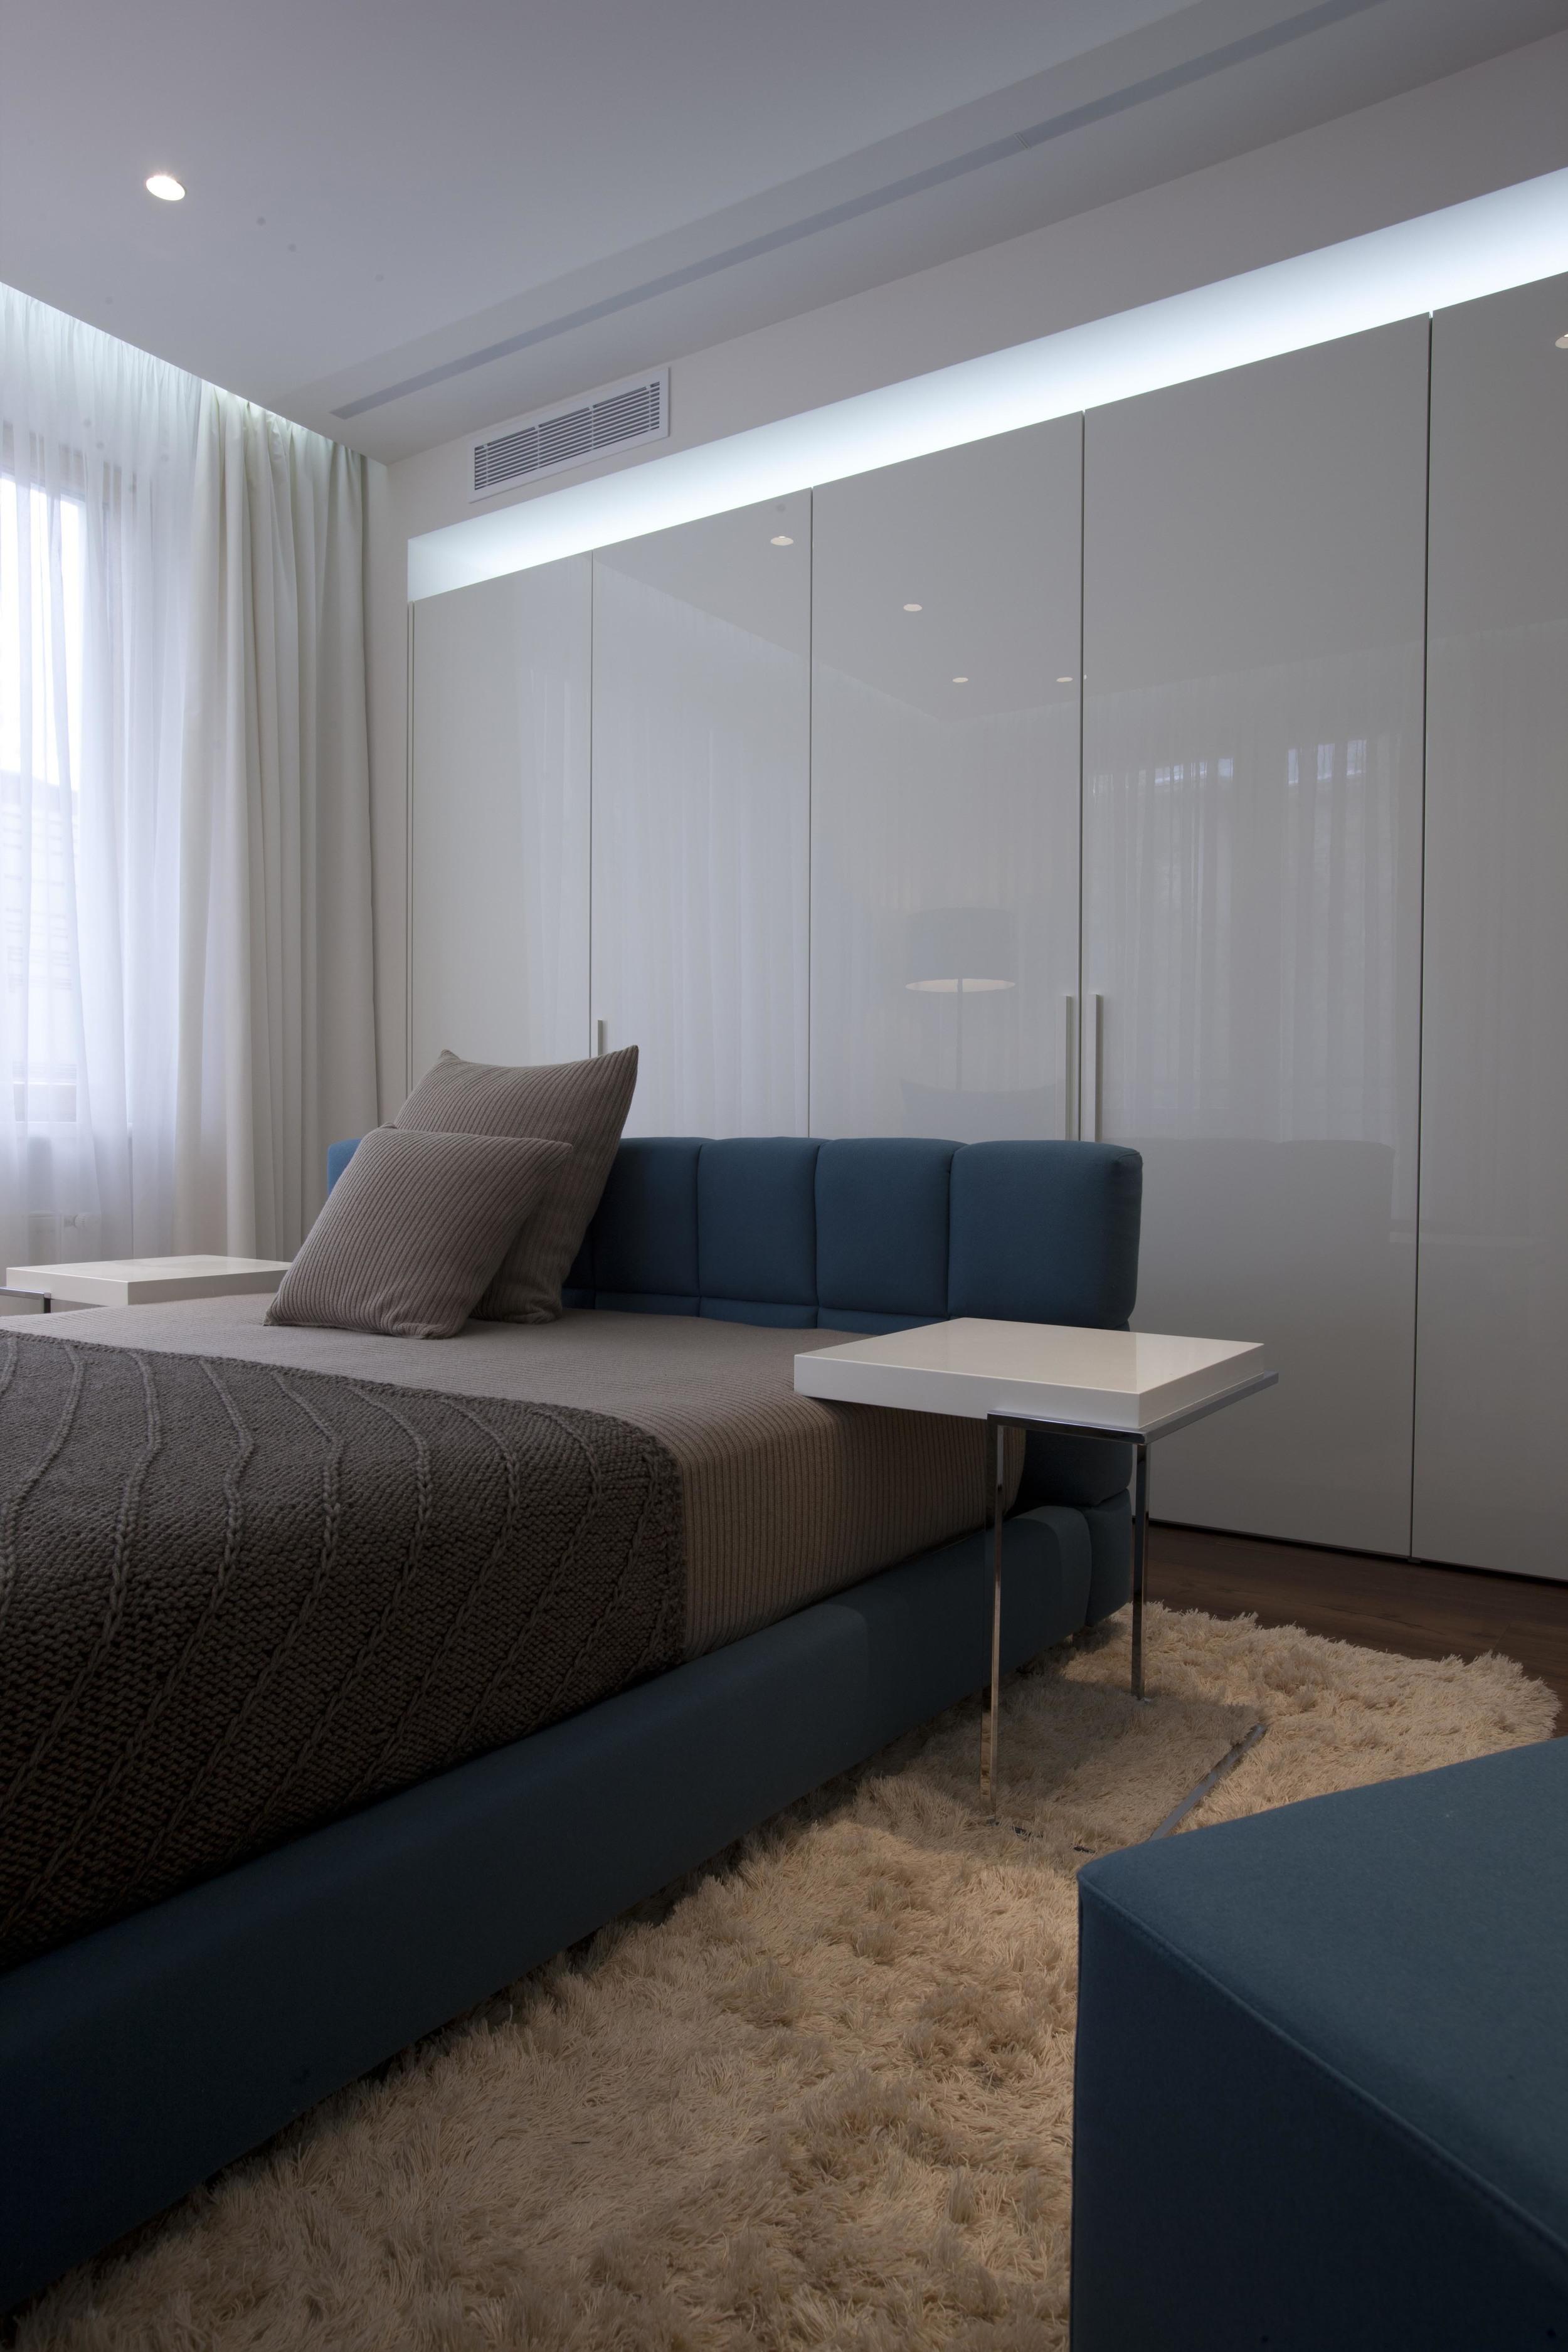 12_ub_pechatnikov3_bedroom_3.jpg